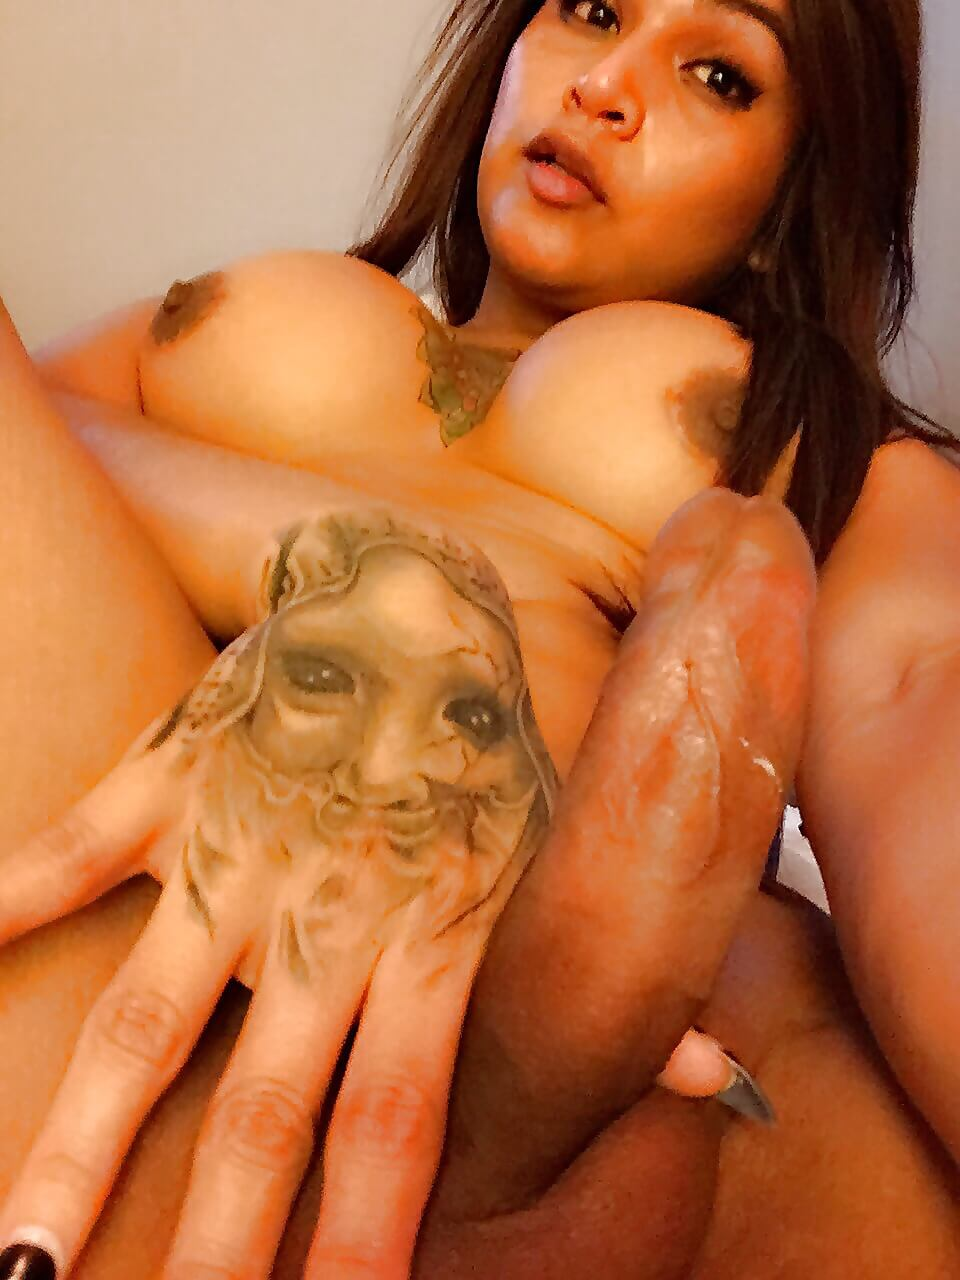 shemale selfie latina trans